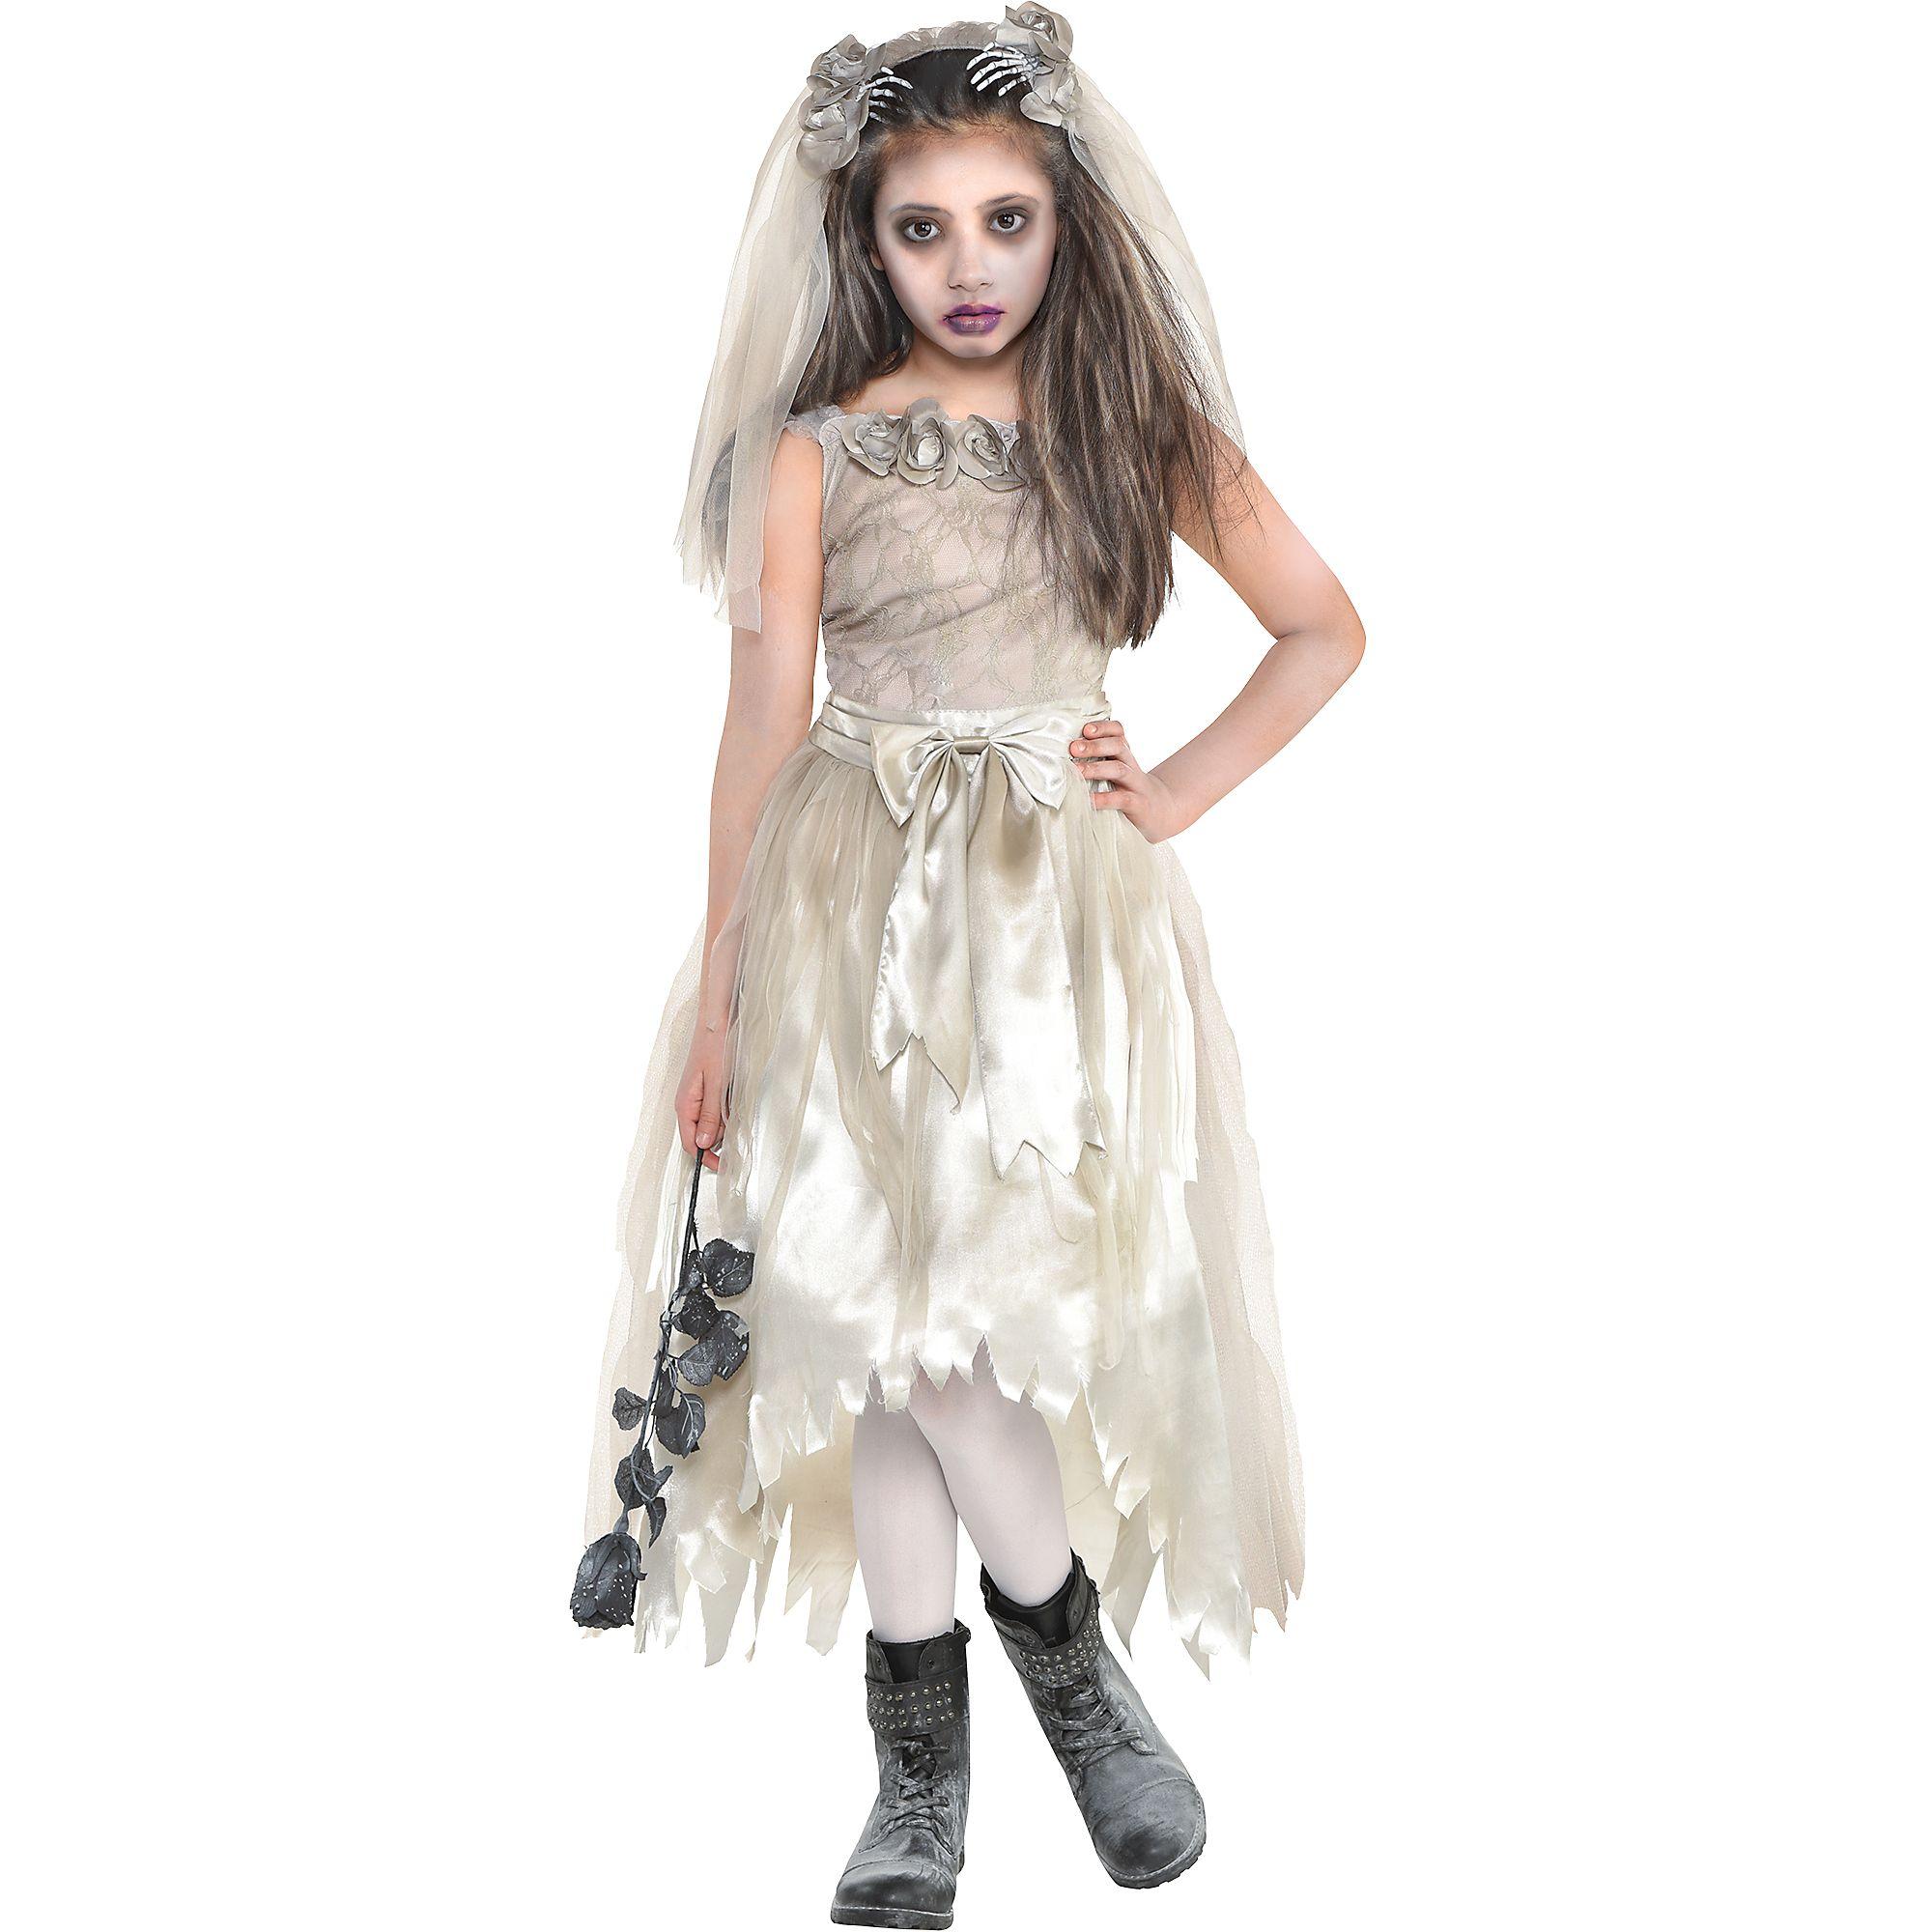 Zombie Bride Dress Halloween Costume For Girls, Extra